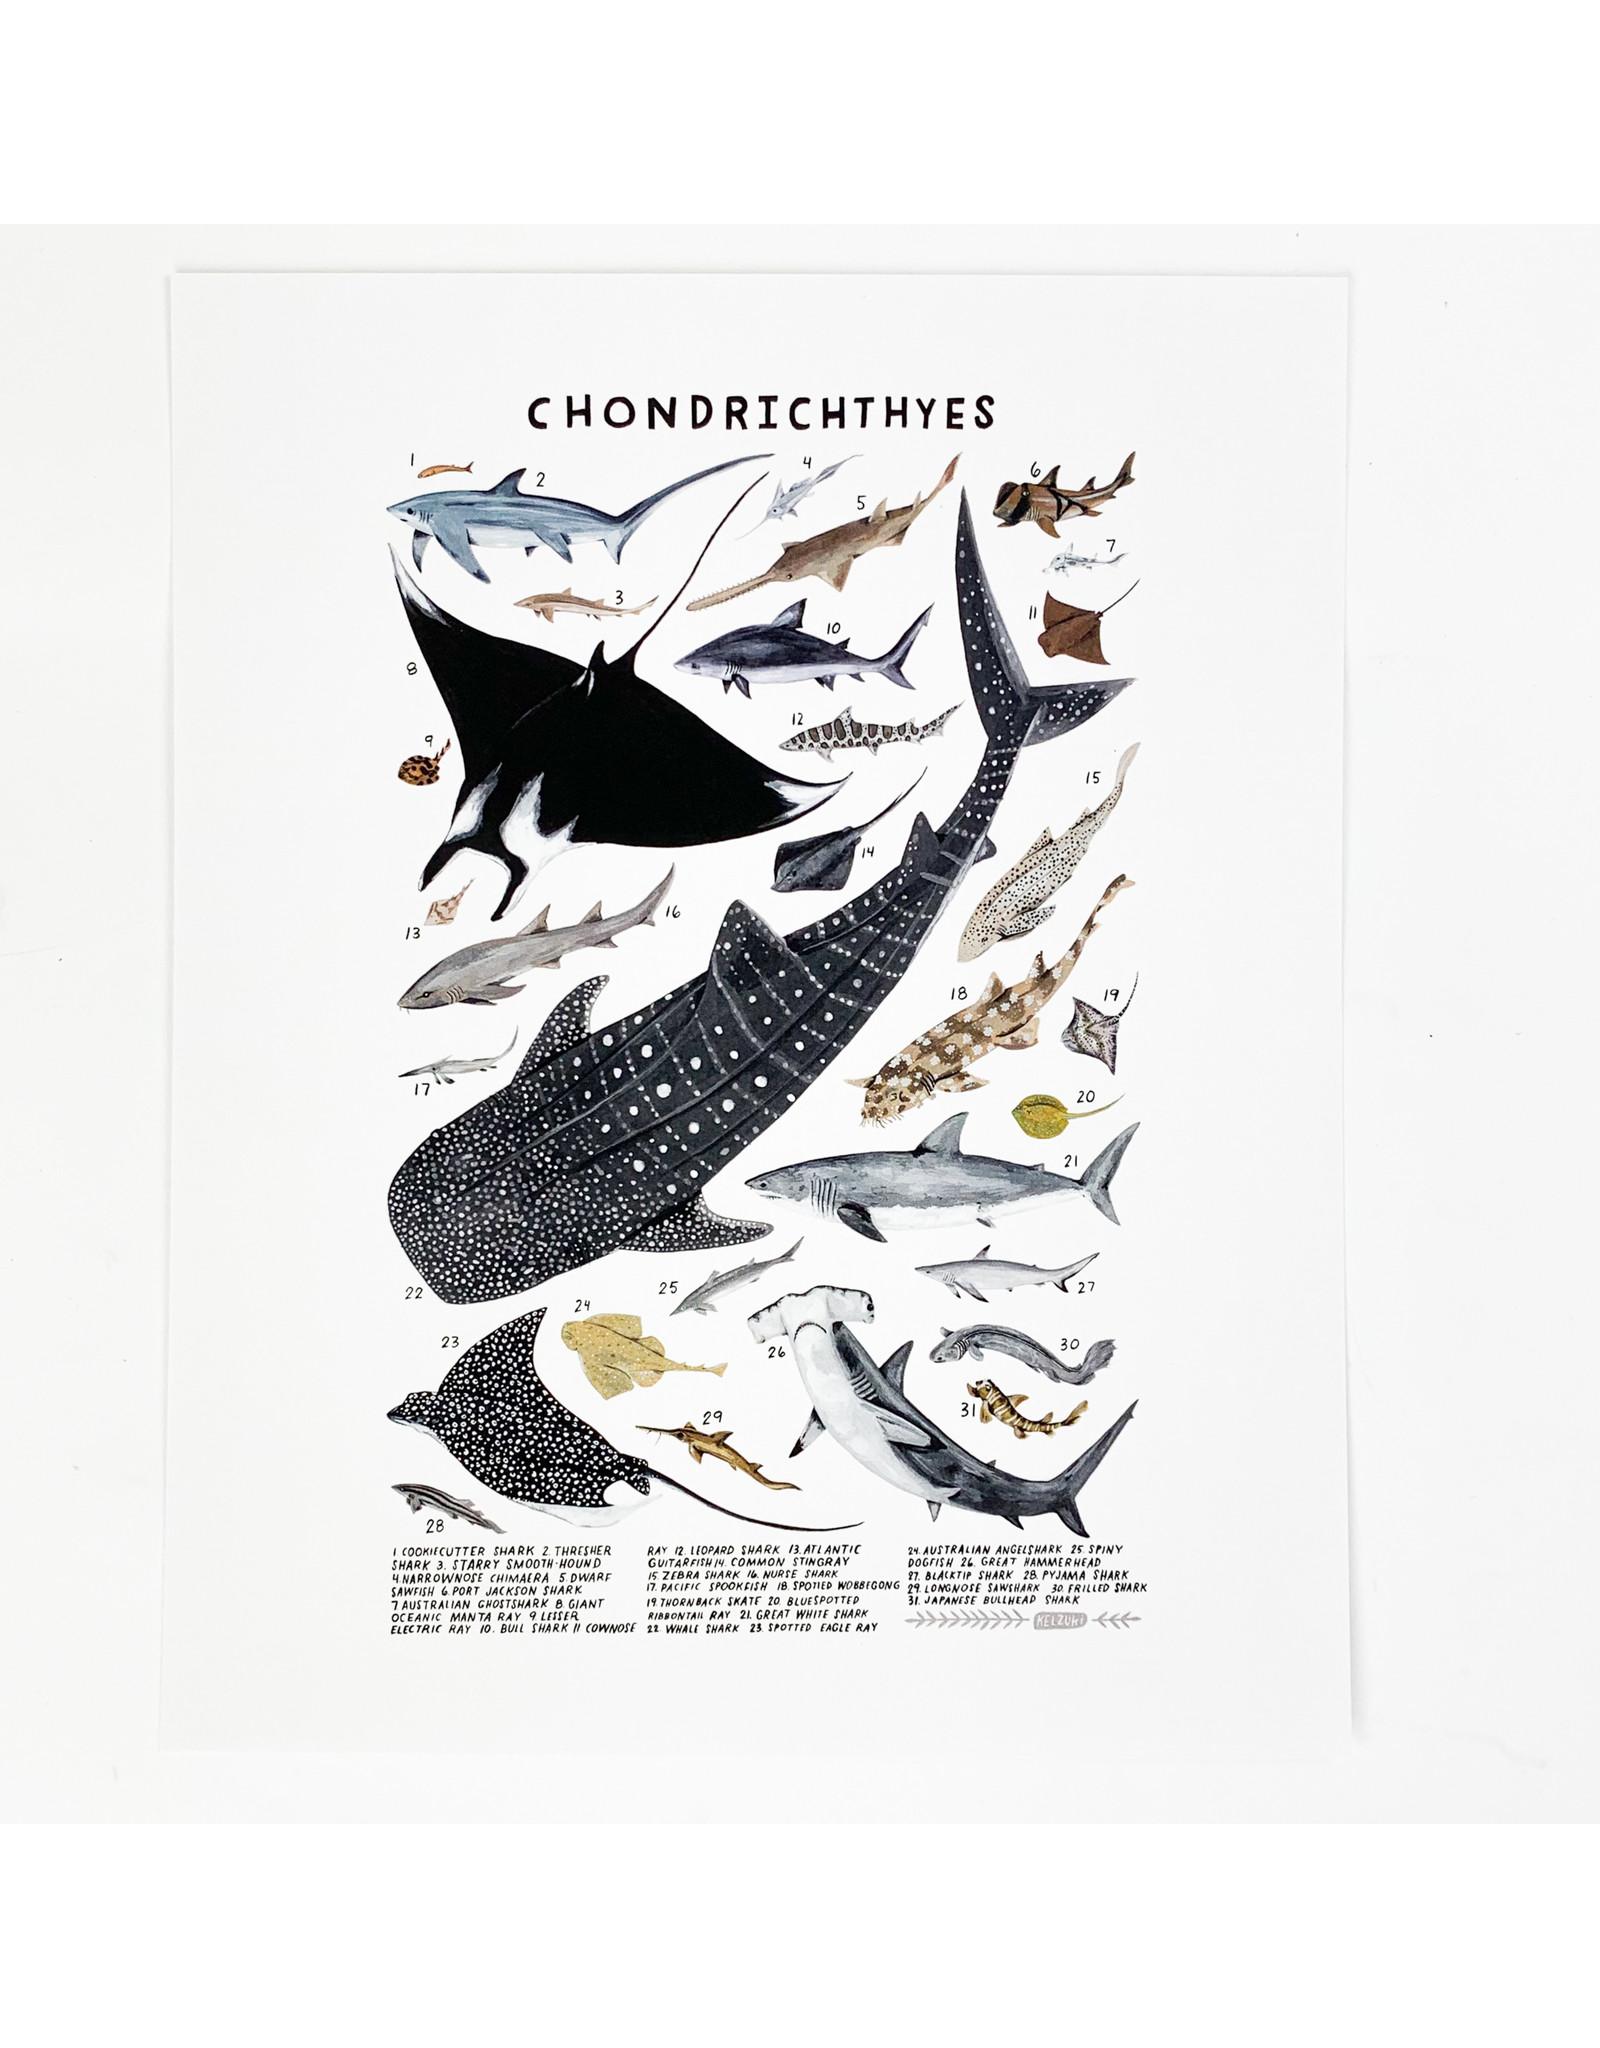 Kelzuki/Consignment Mini Print Consignment - Chondrichthyes